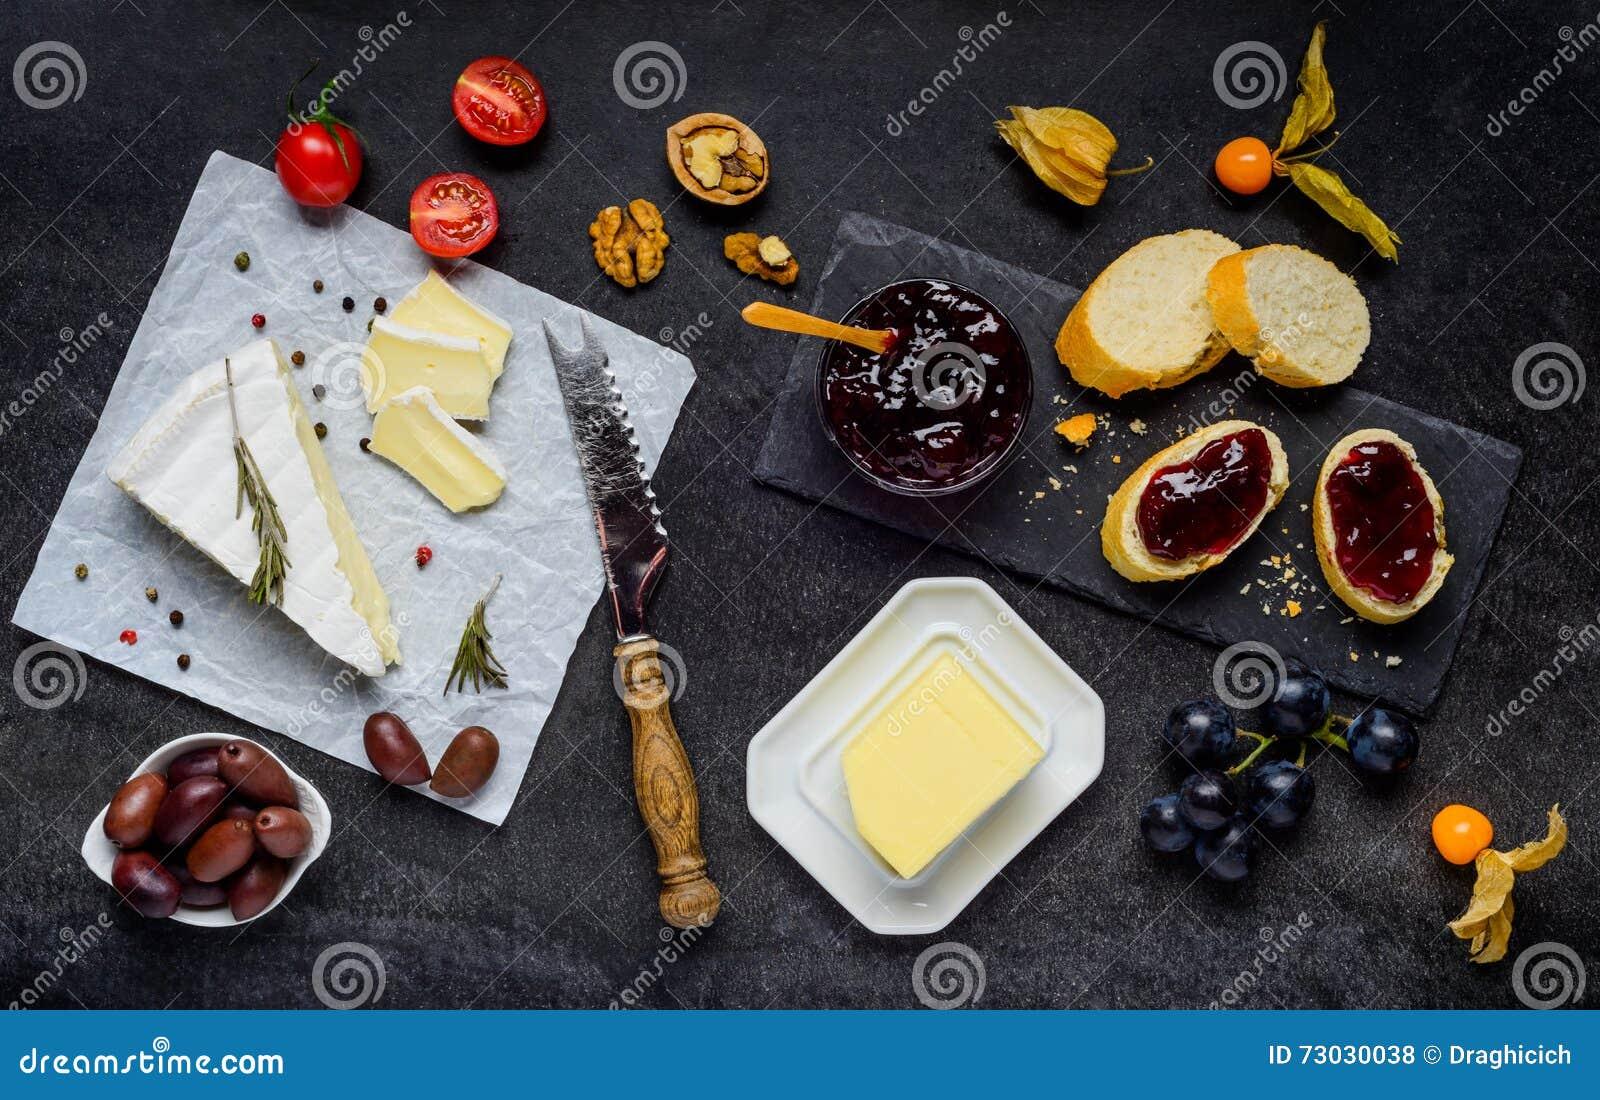 Brie Cheese com doce, forma de sustento